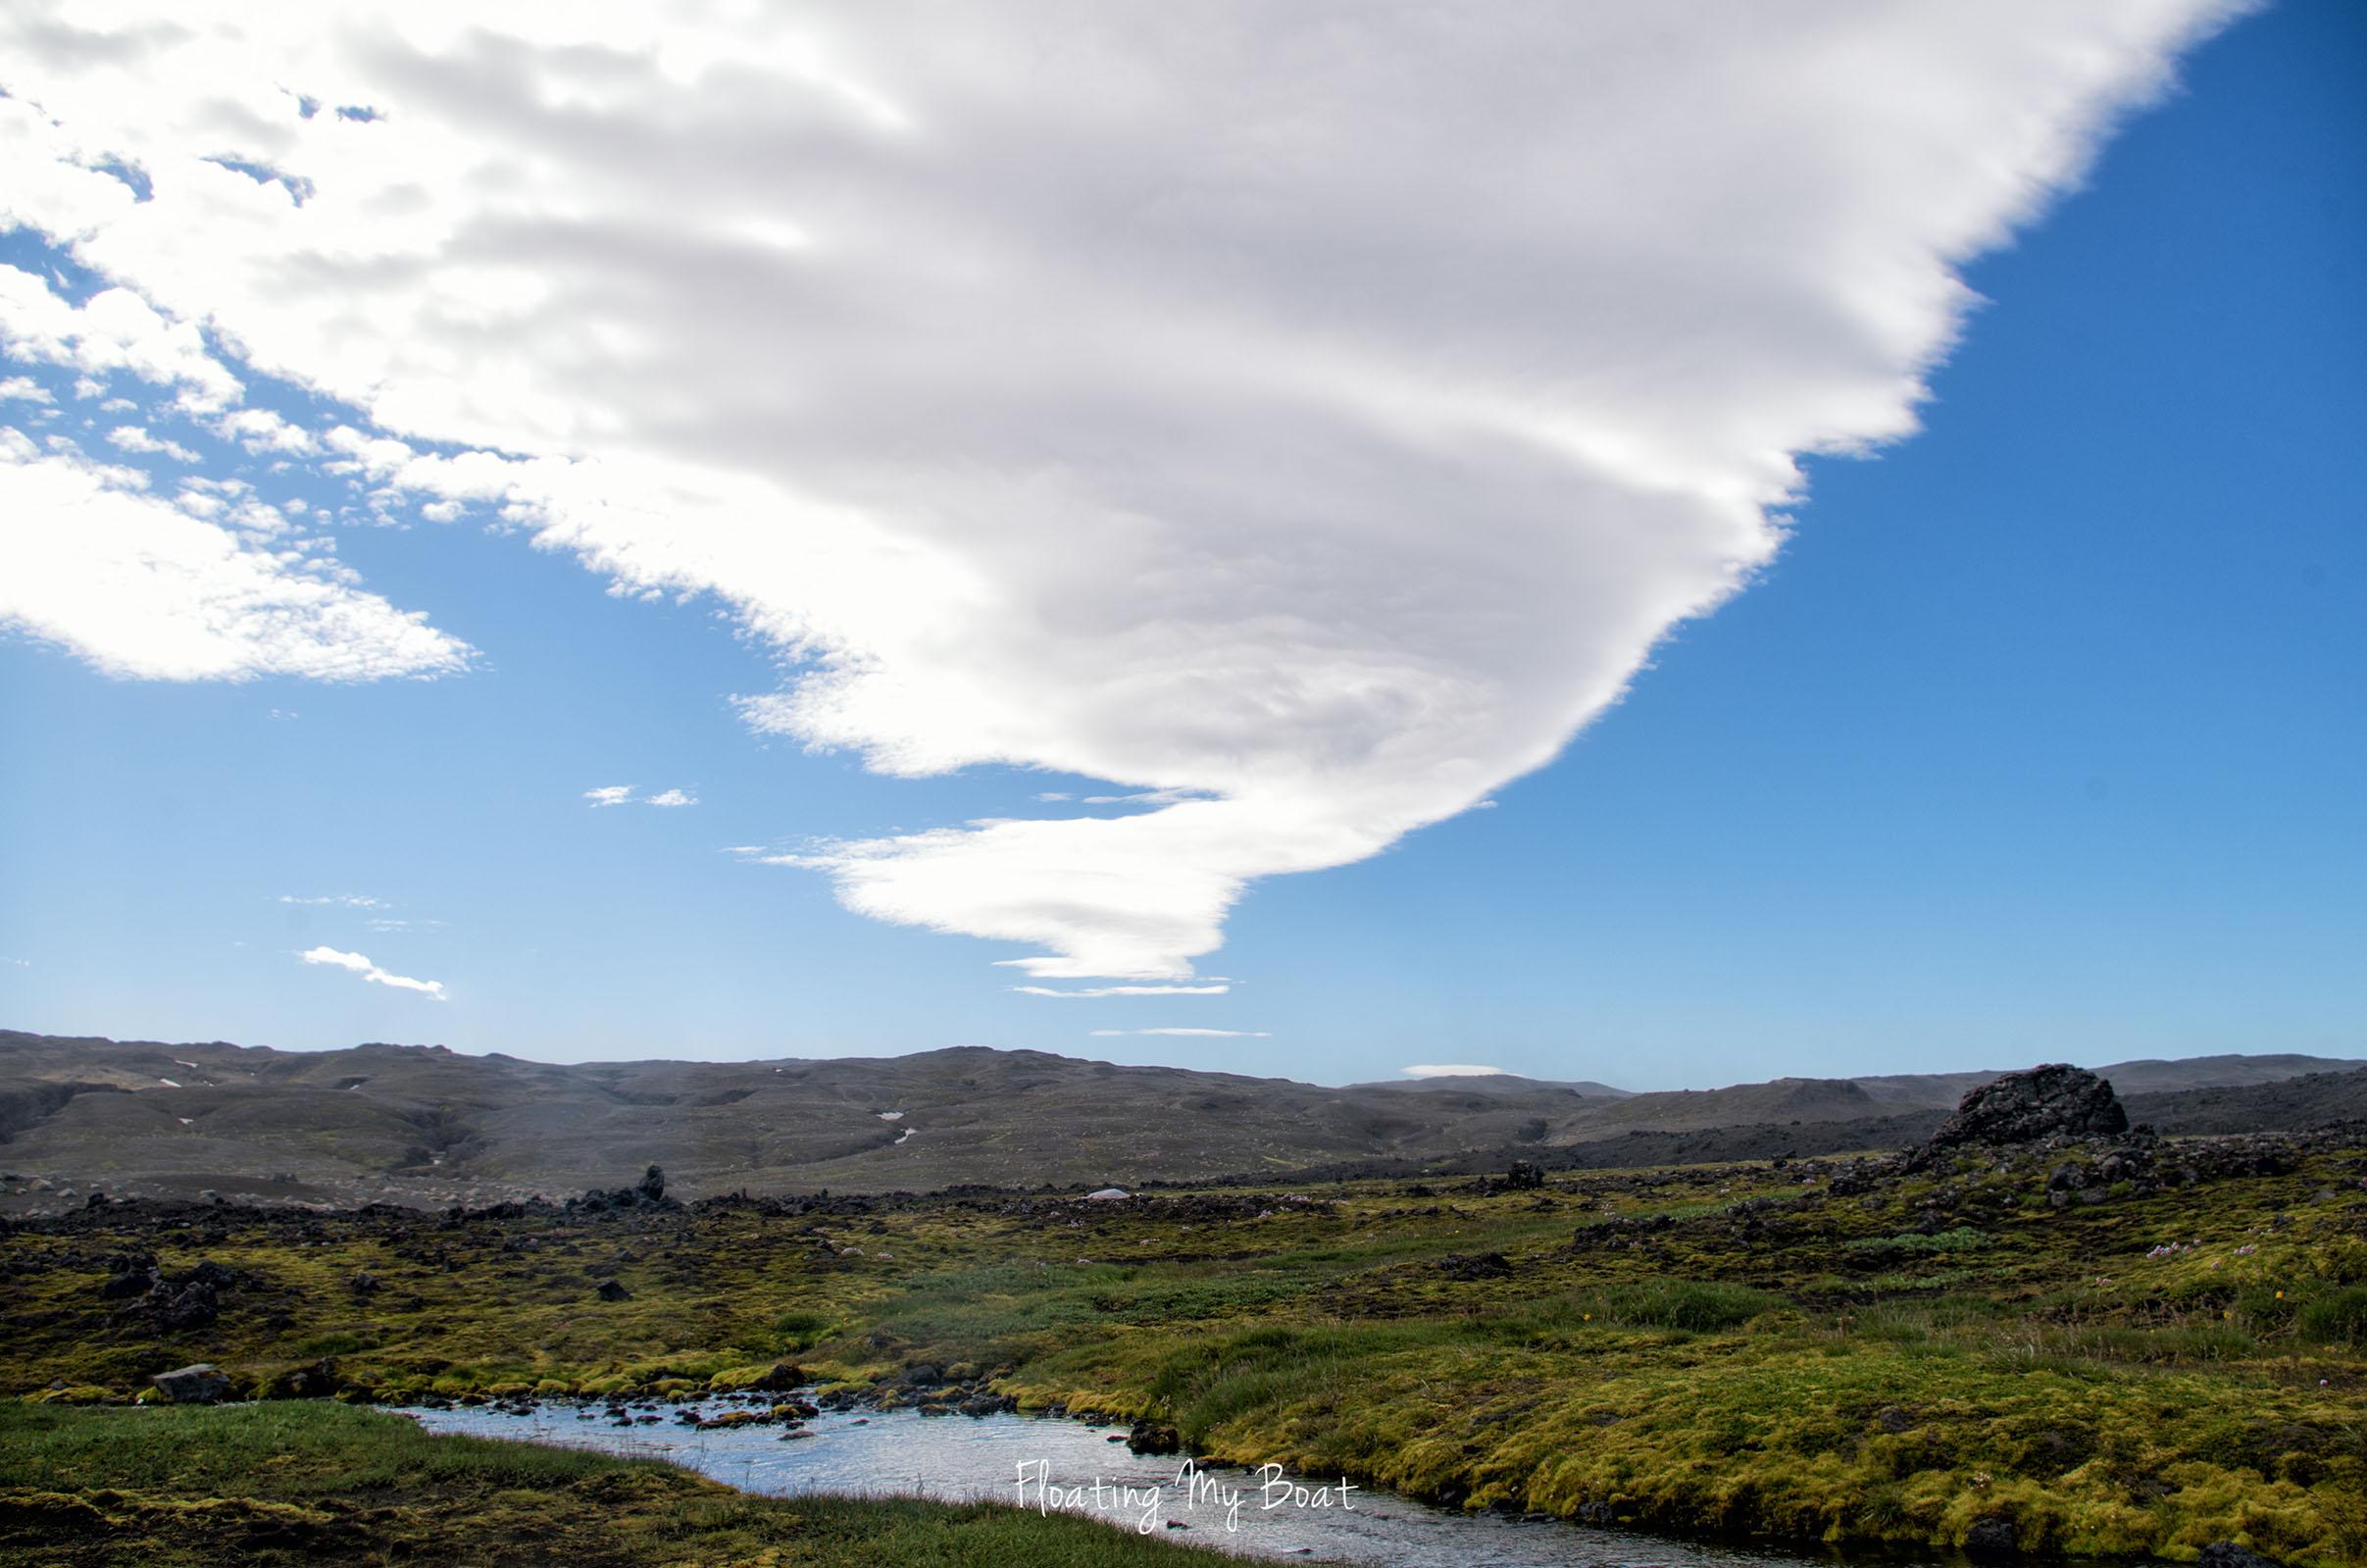 trekking-iceland-vatnajokull-national-park-52